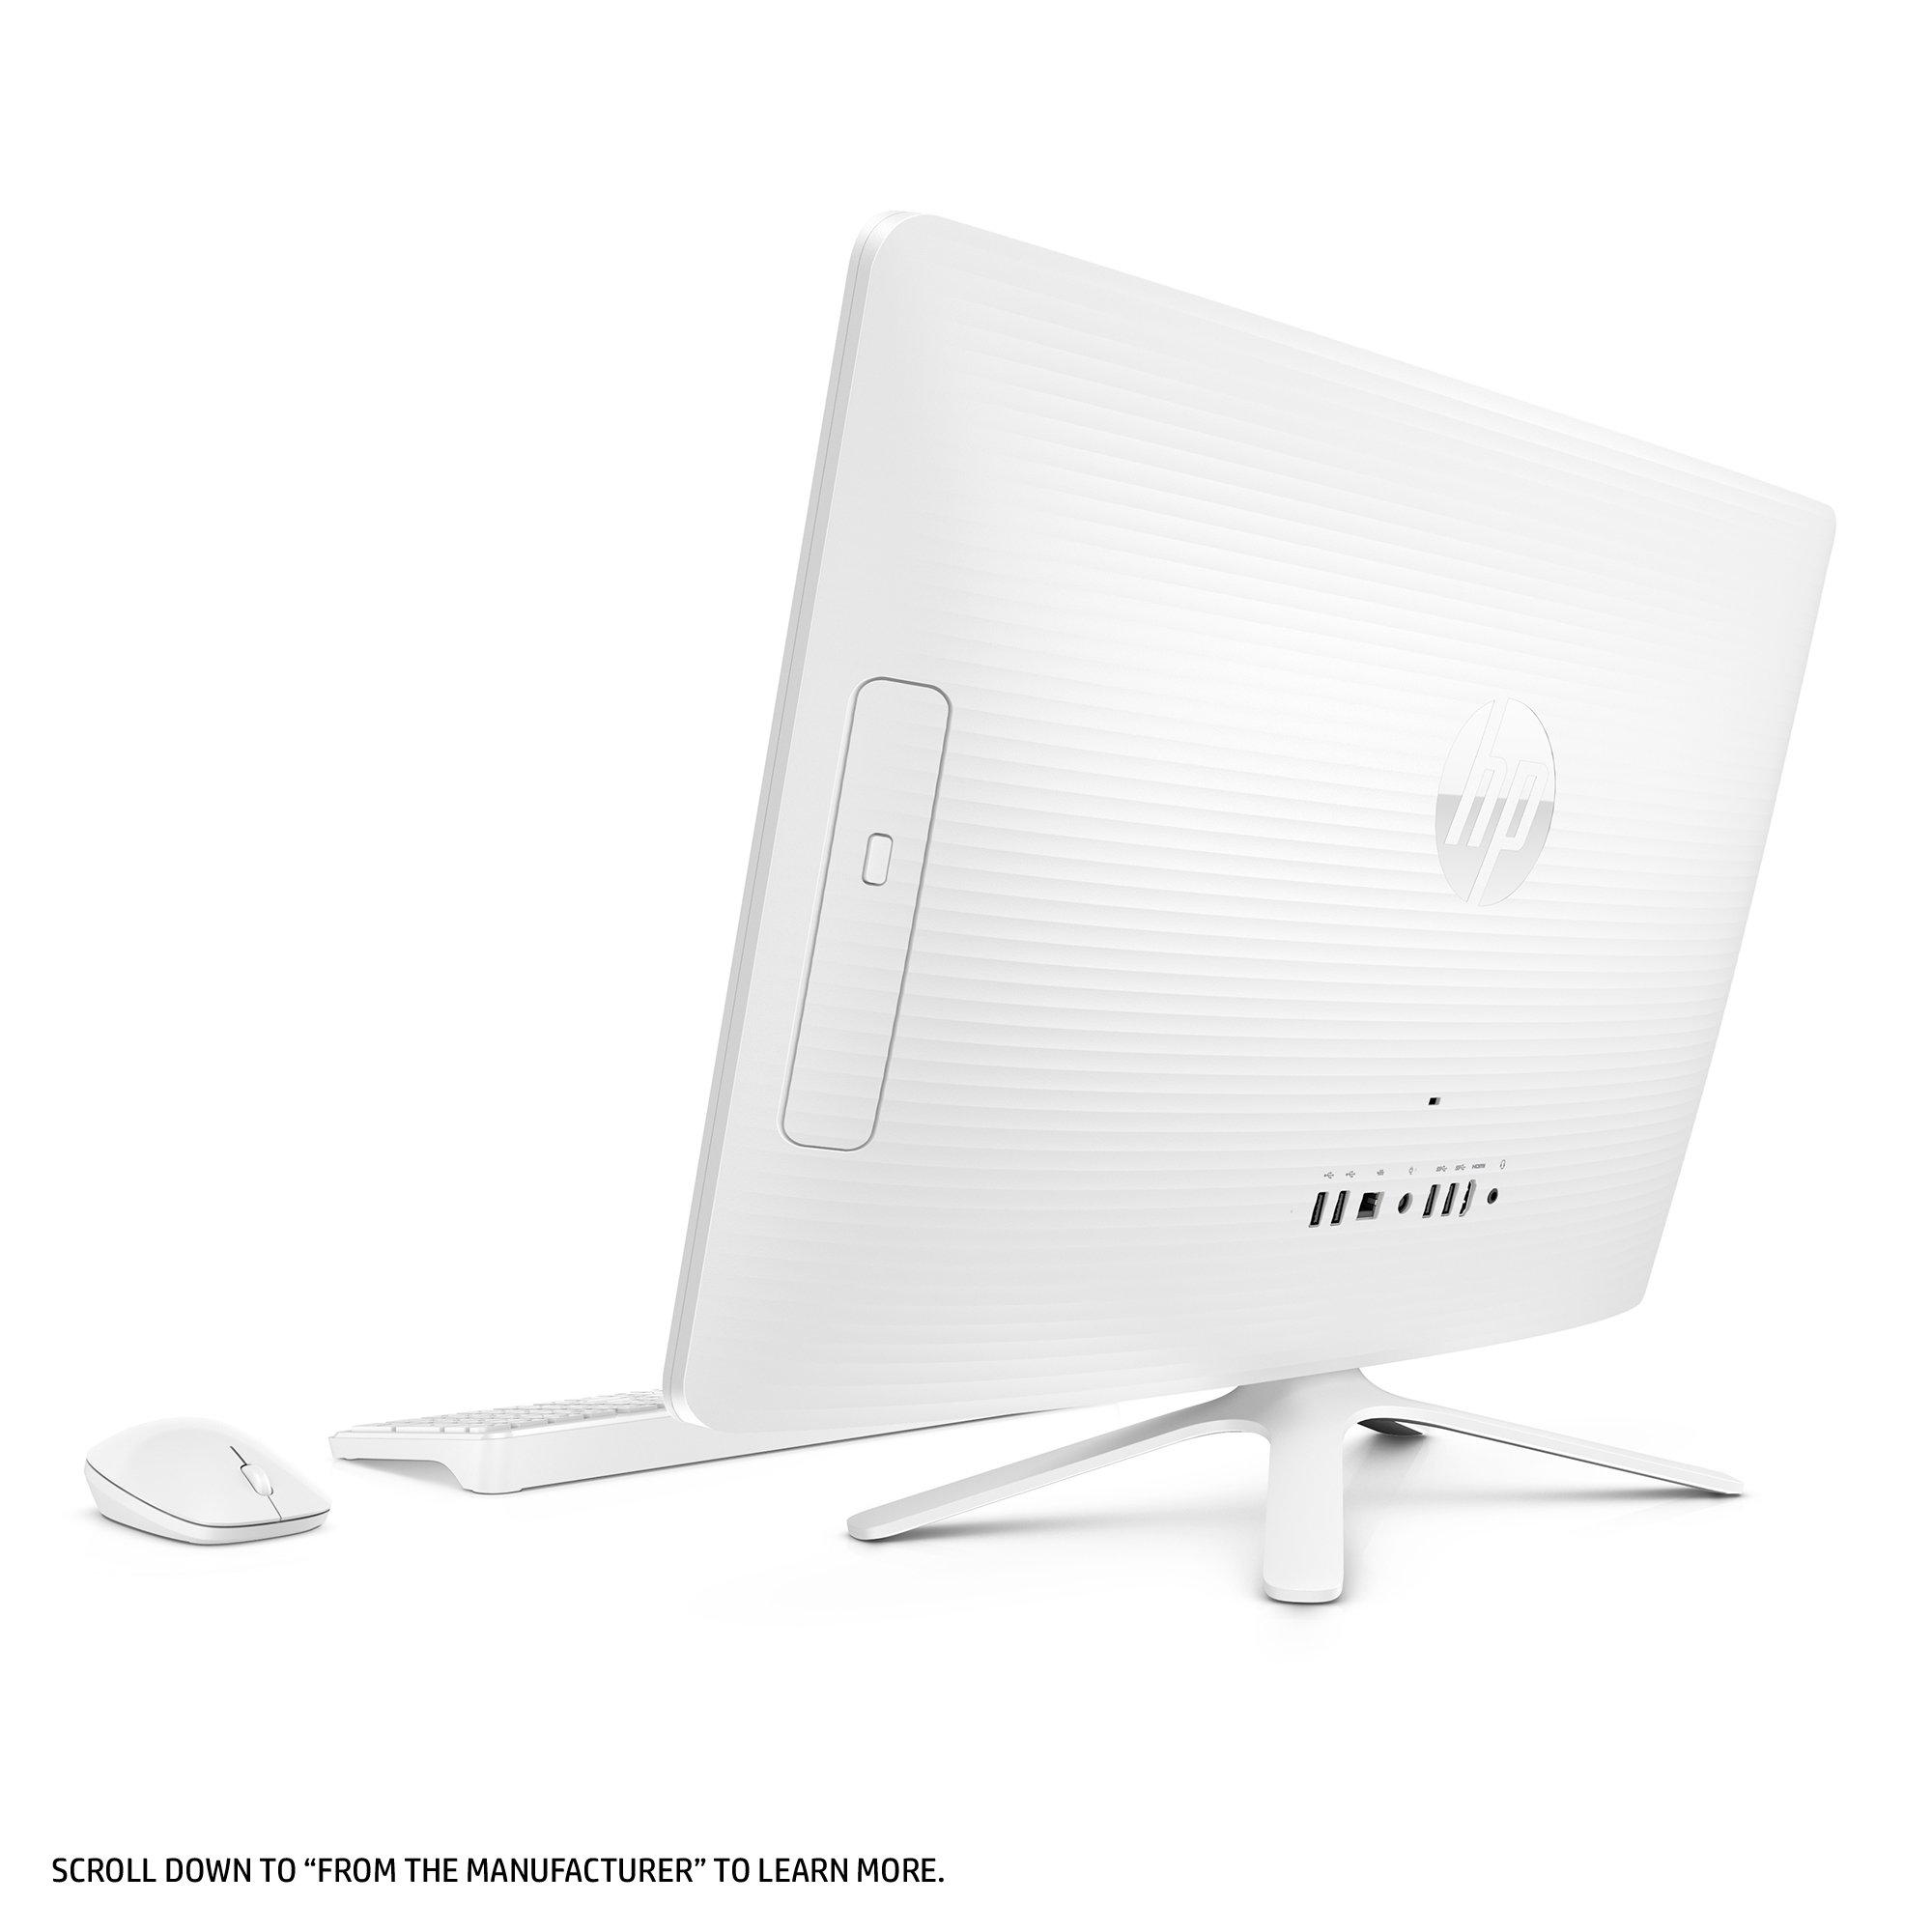 HP 24-inch All-in-One Computer, Intel Core i3-7100U, 4GB RAM, 1TB hard drive, Windows 10 (24-g230, White) by HP (Image #4)